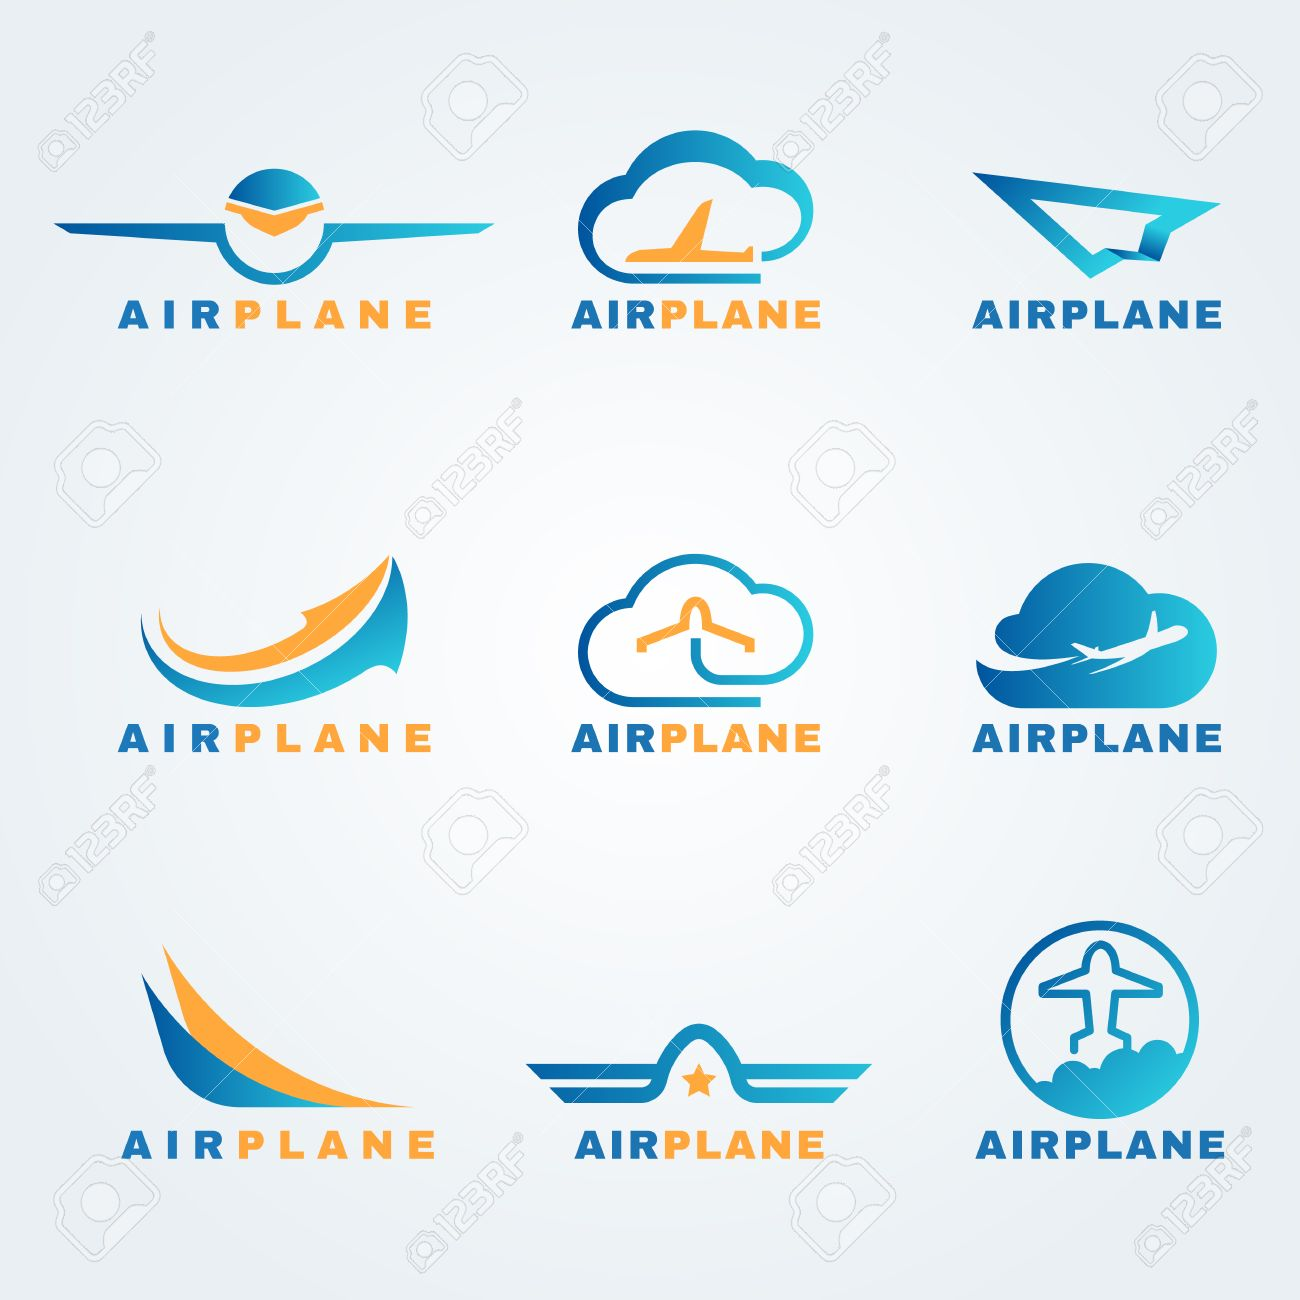 Rocket and air plane logo vector set design - 58013534